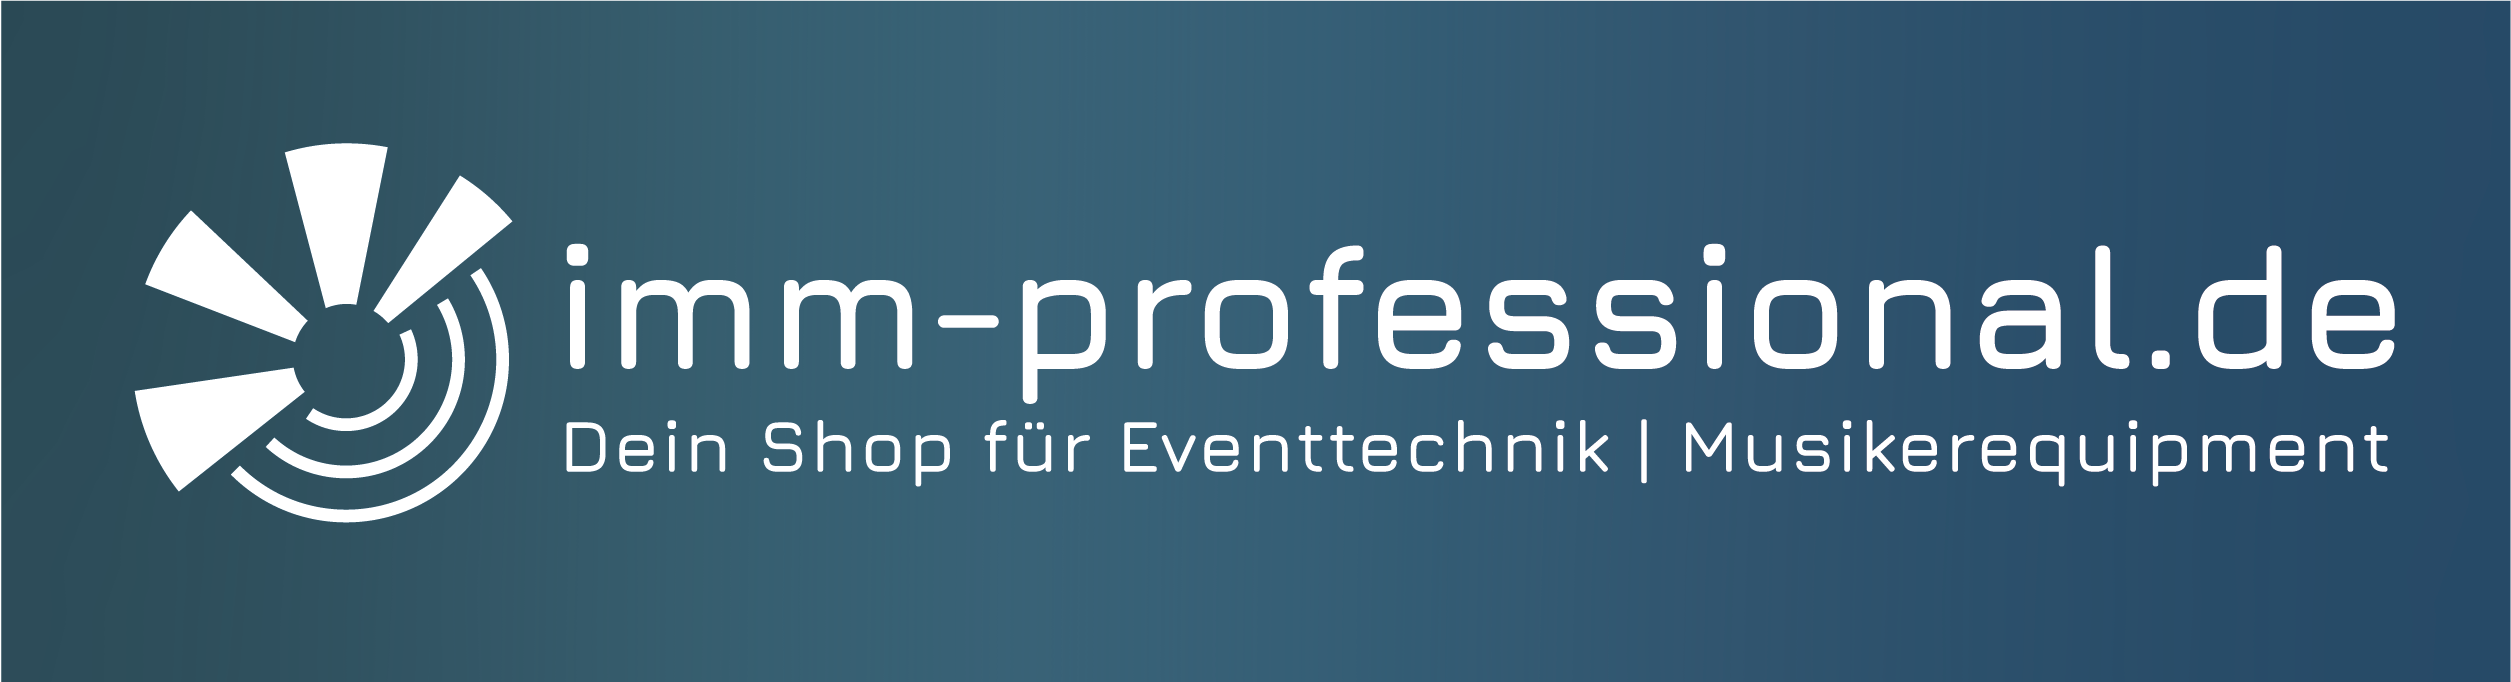 Logo-Redesign für imm-professional aus Alfeld